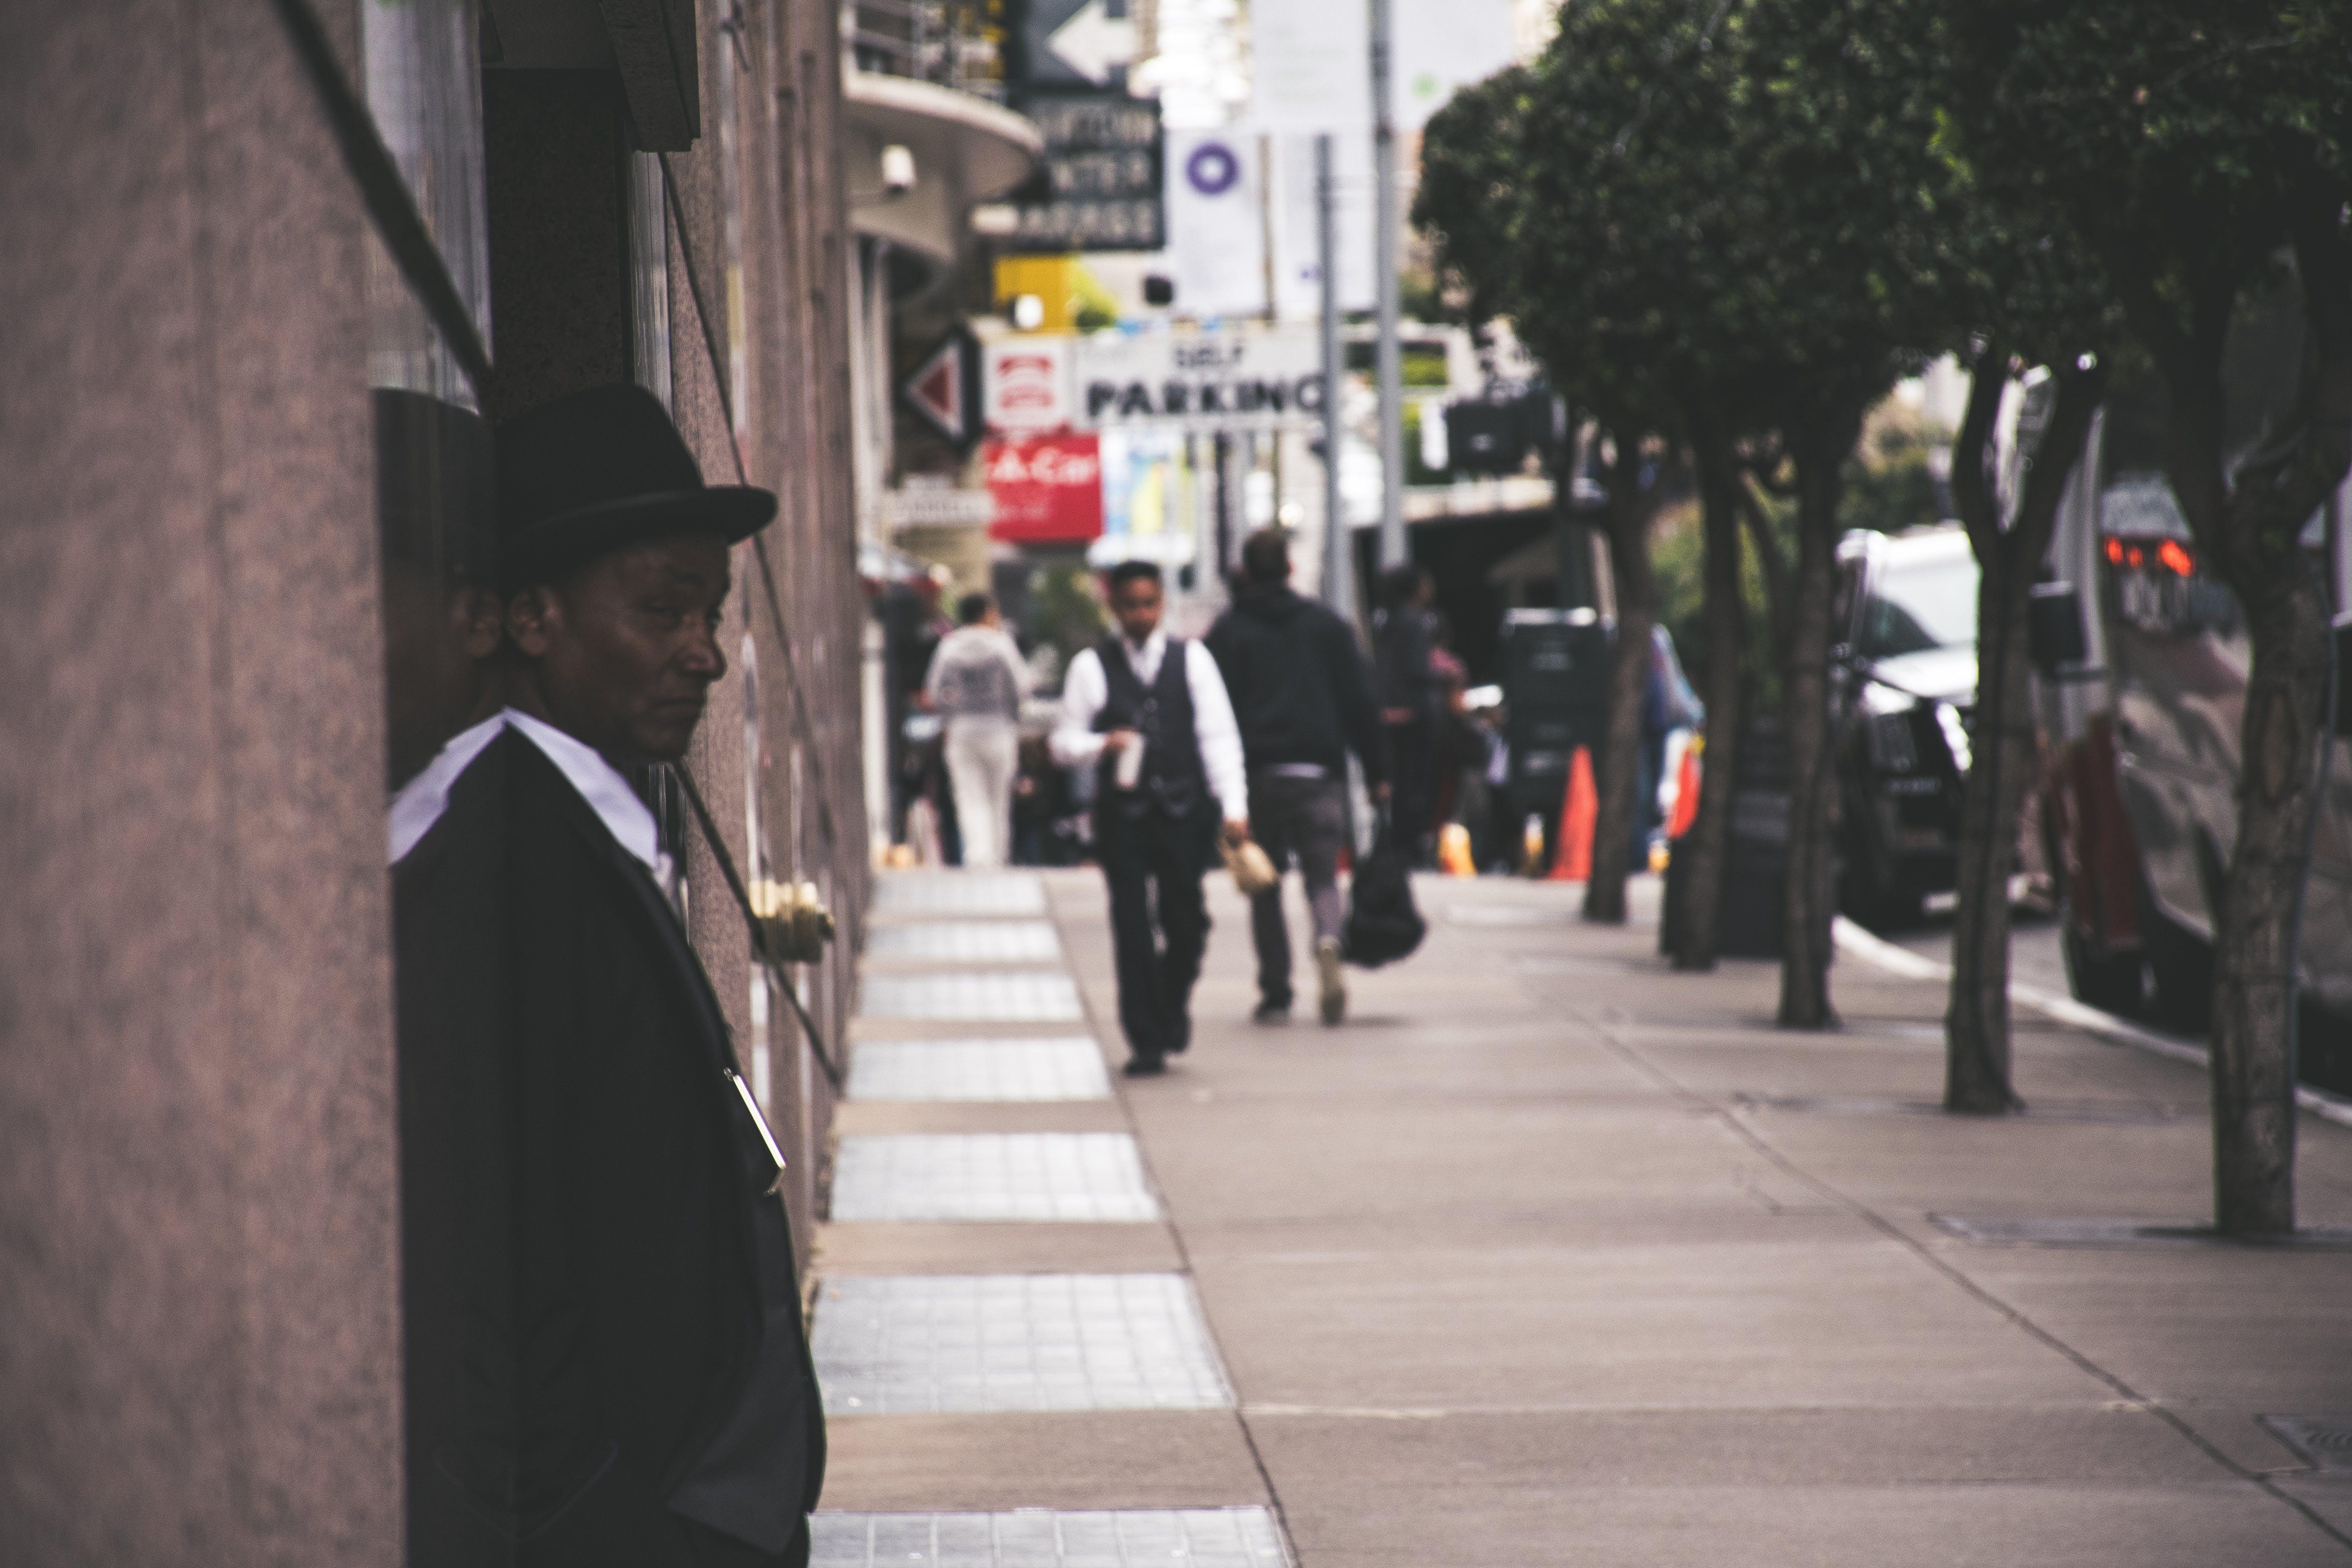 Man Wearing Black Blazer Beside Building